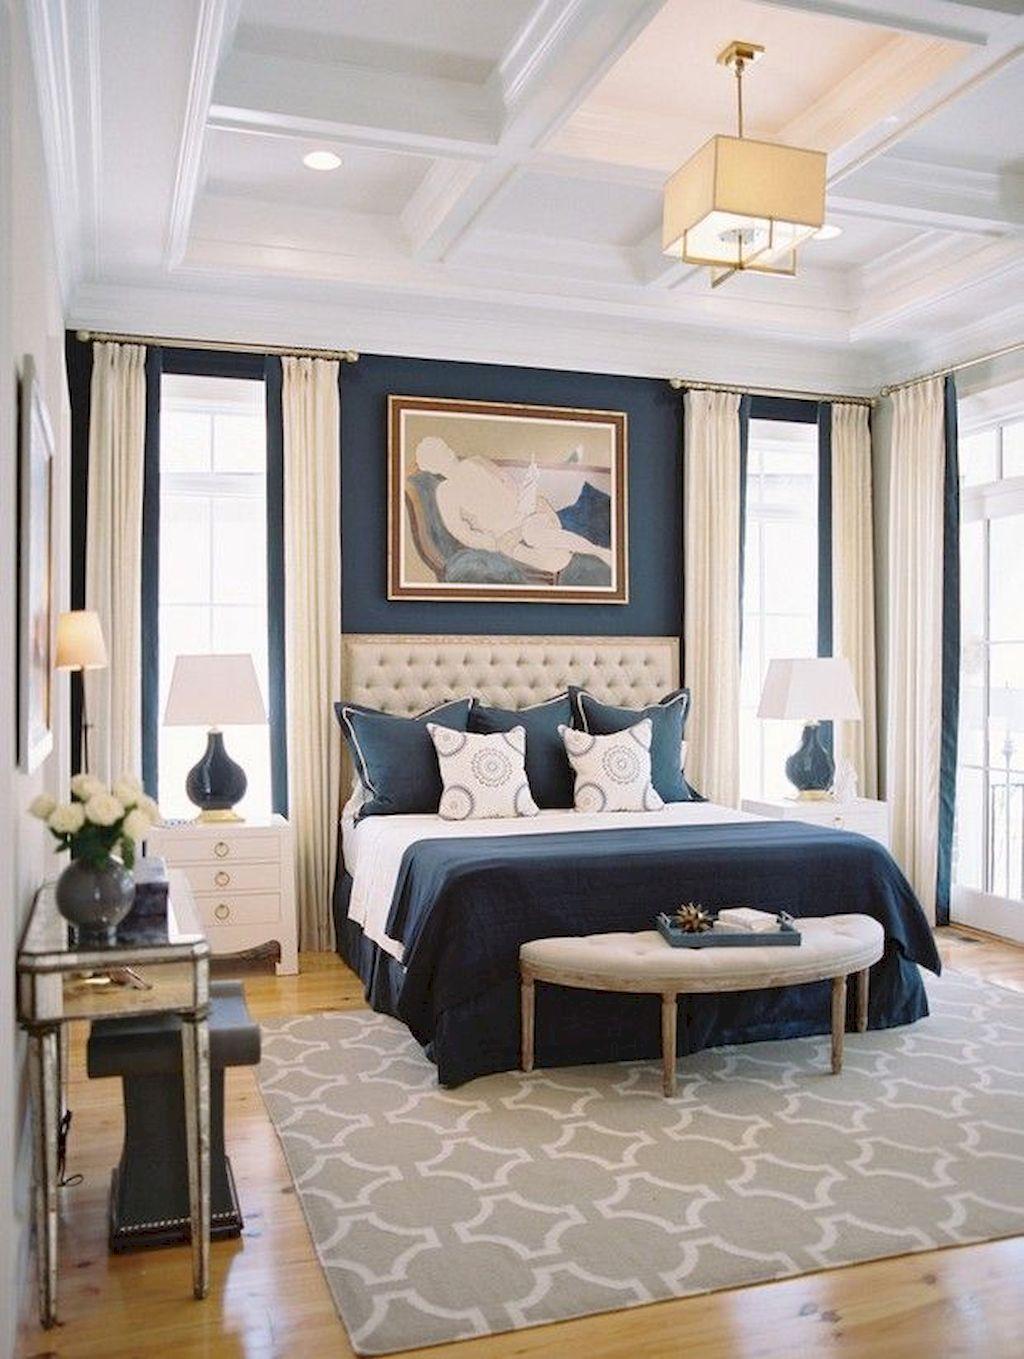 Beautiful Bedroom Designs In Darker Color Combination To Create Deeper Mood Effect Part Transitional Bedroom Design Cool Bedroom Furniture Small Master Bedroom Beautiful transitional master bedroom